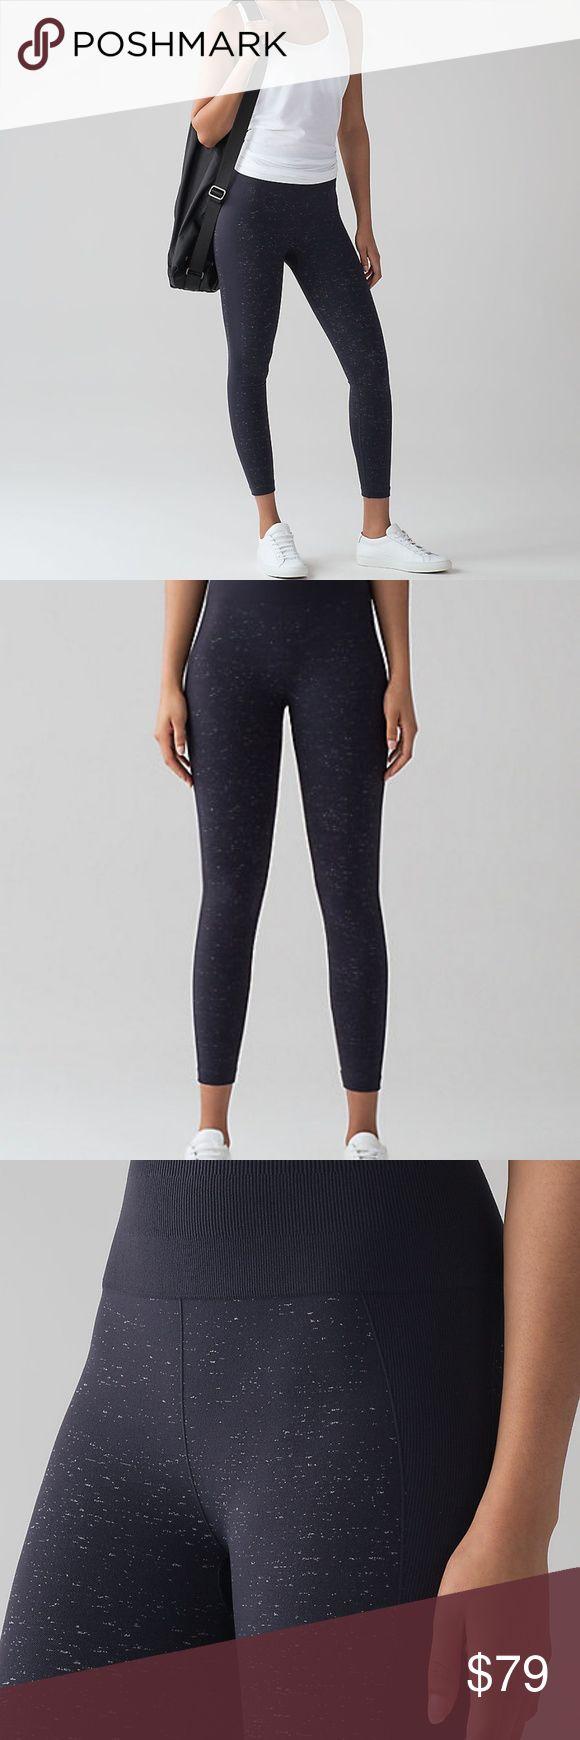 39f6a16f89 Lululemon Free to Flow 7 8 Yoga Pants Navy NWT